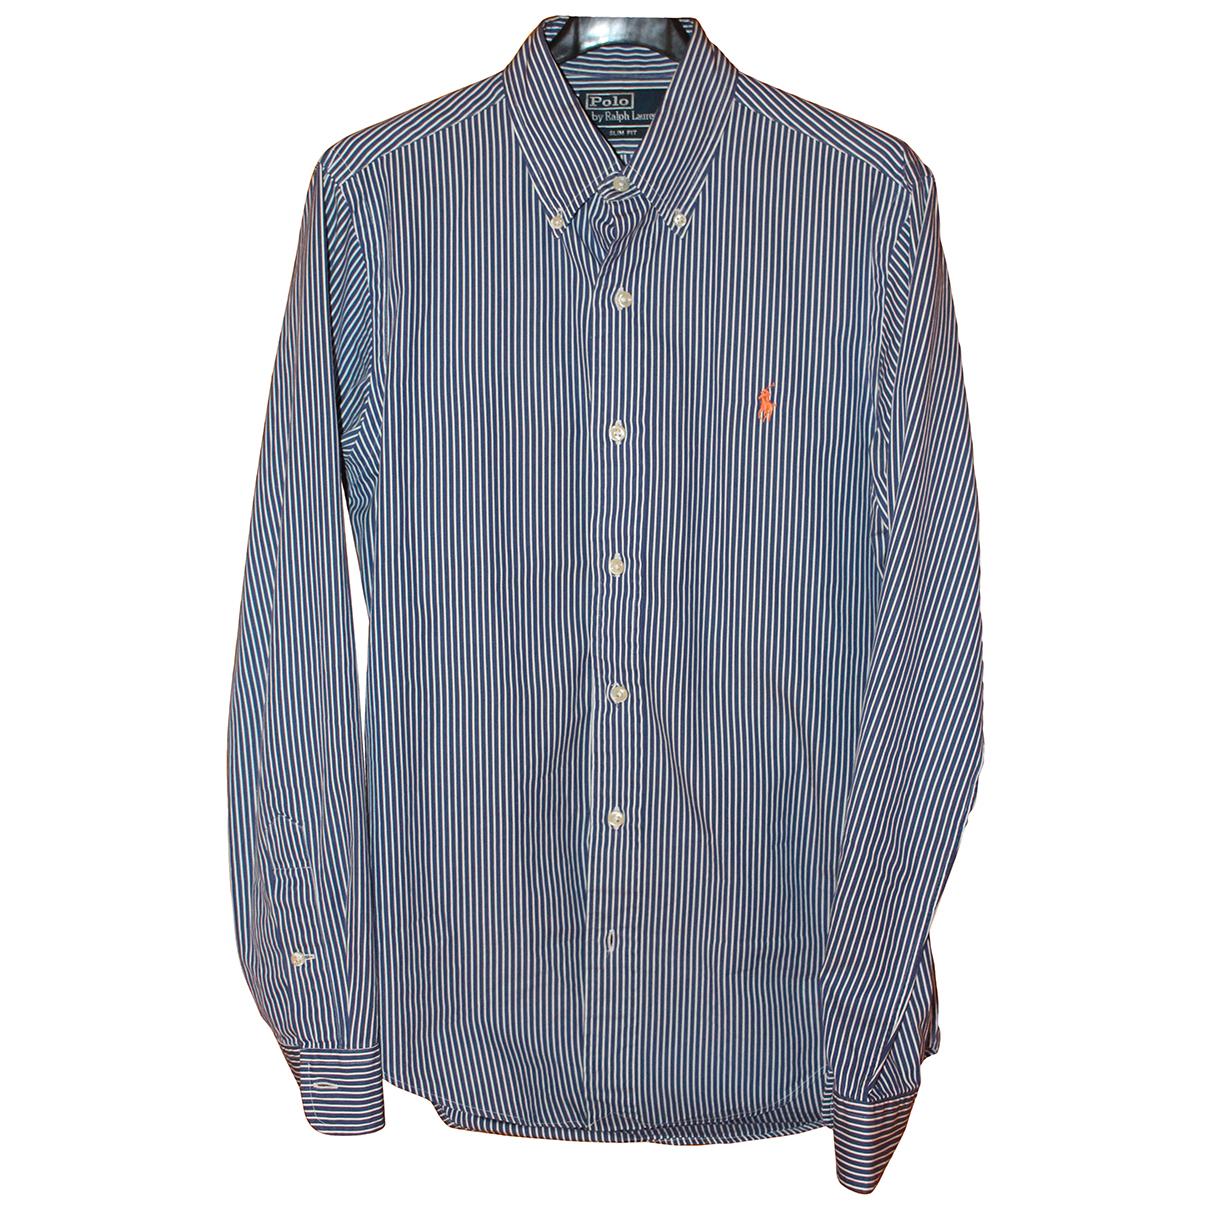 Polo Ralph Lauren N Blue Cotton Shirts for Men S International